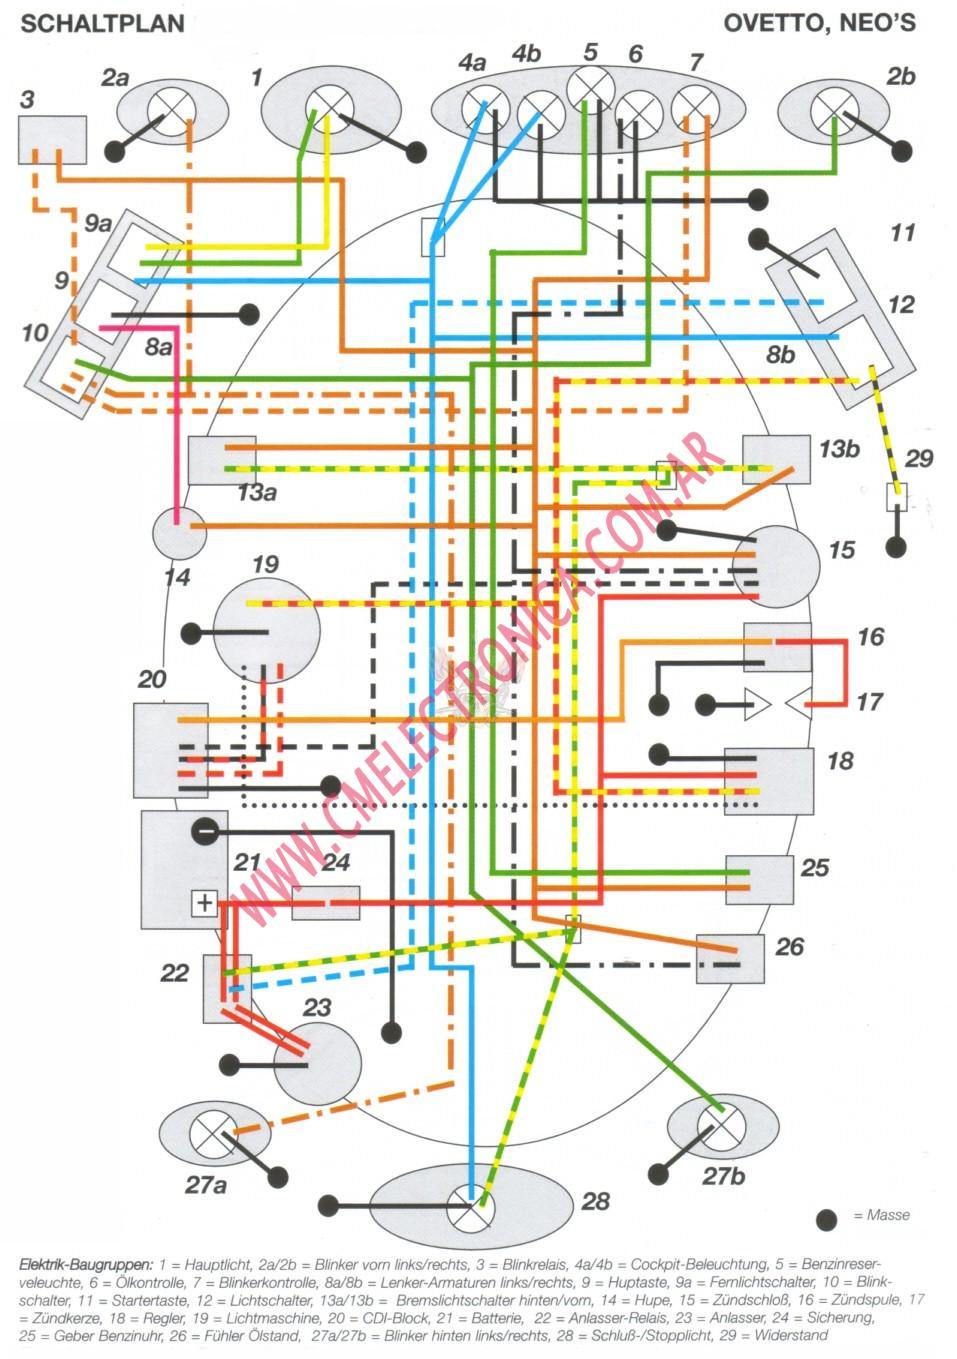 Ремонт электрооборудования скутера Yamaha Neos